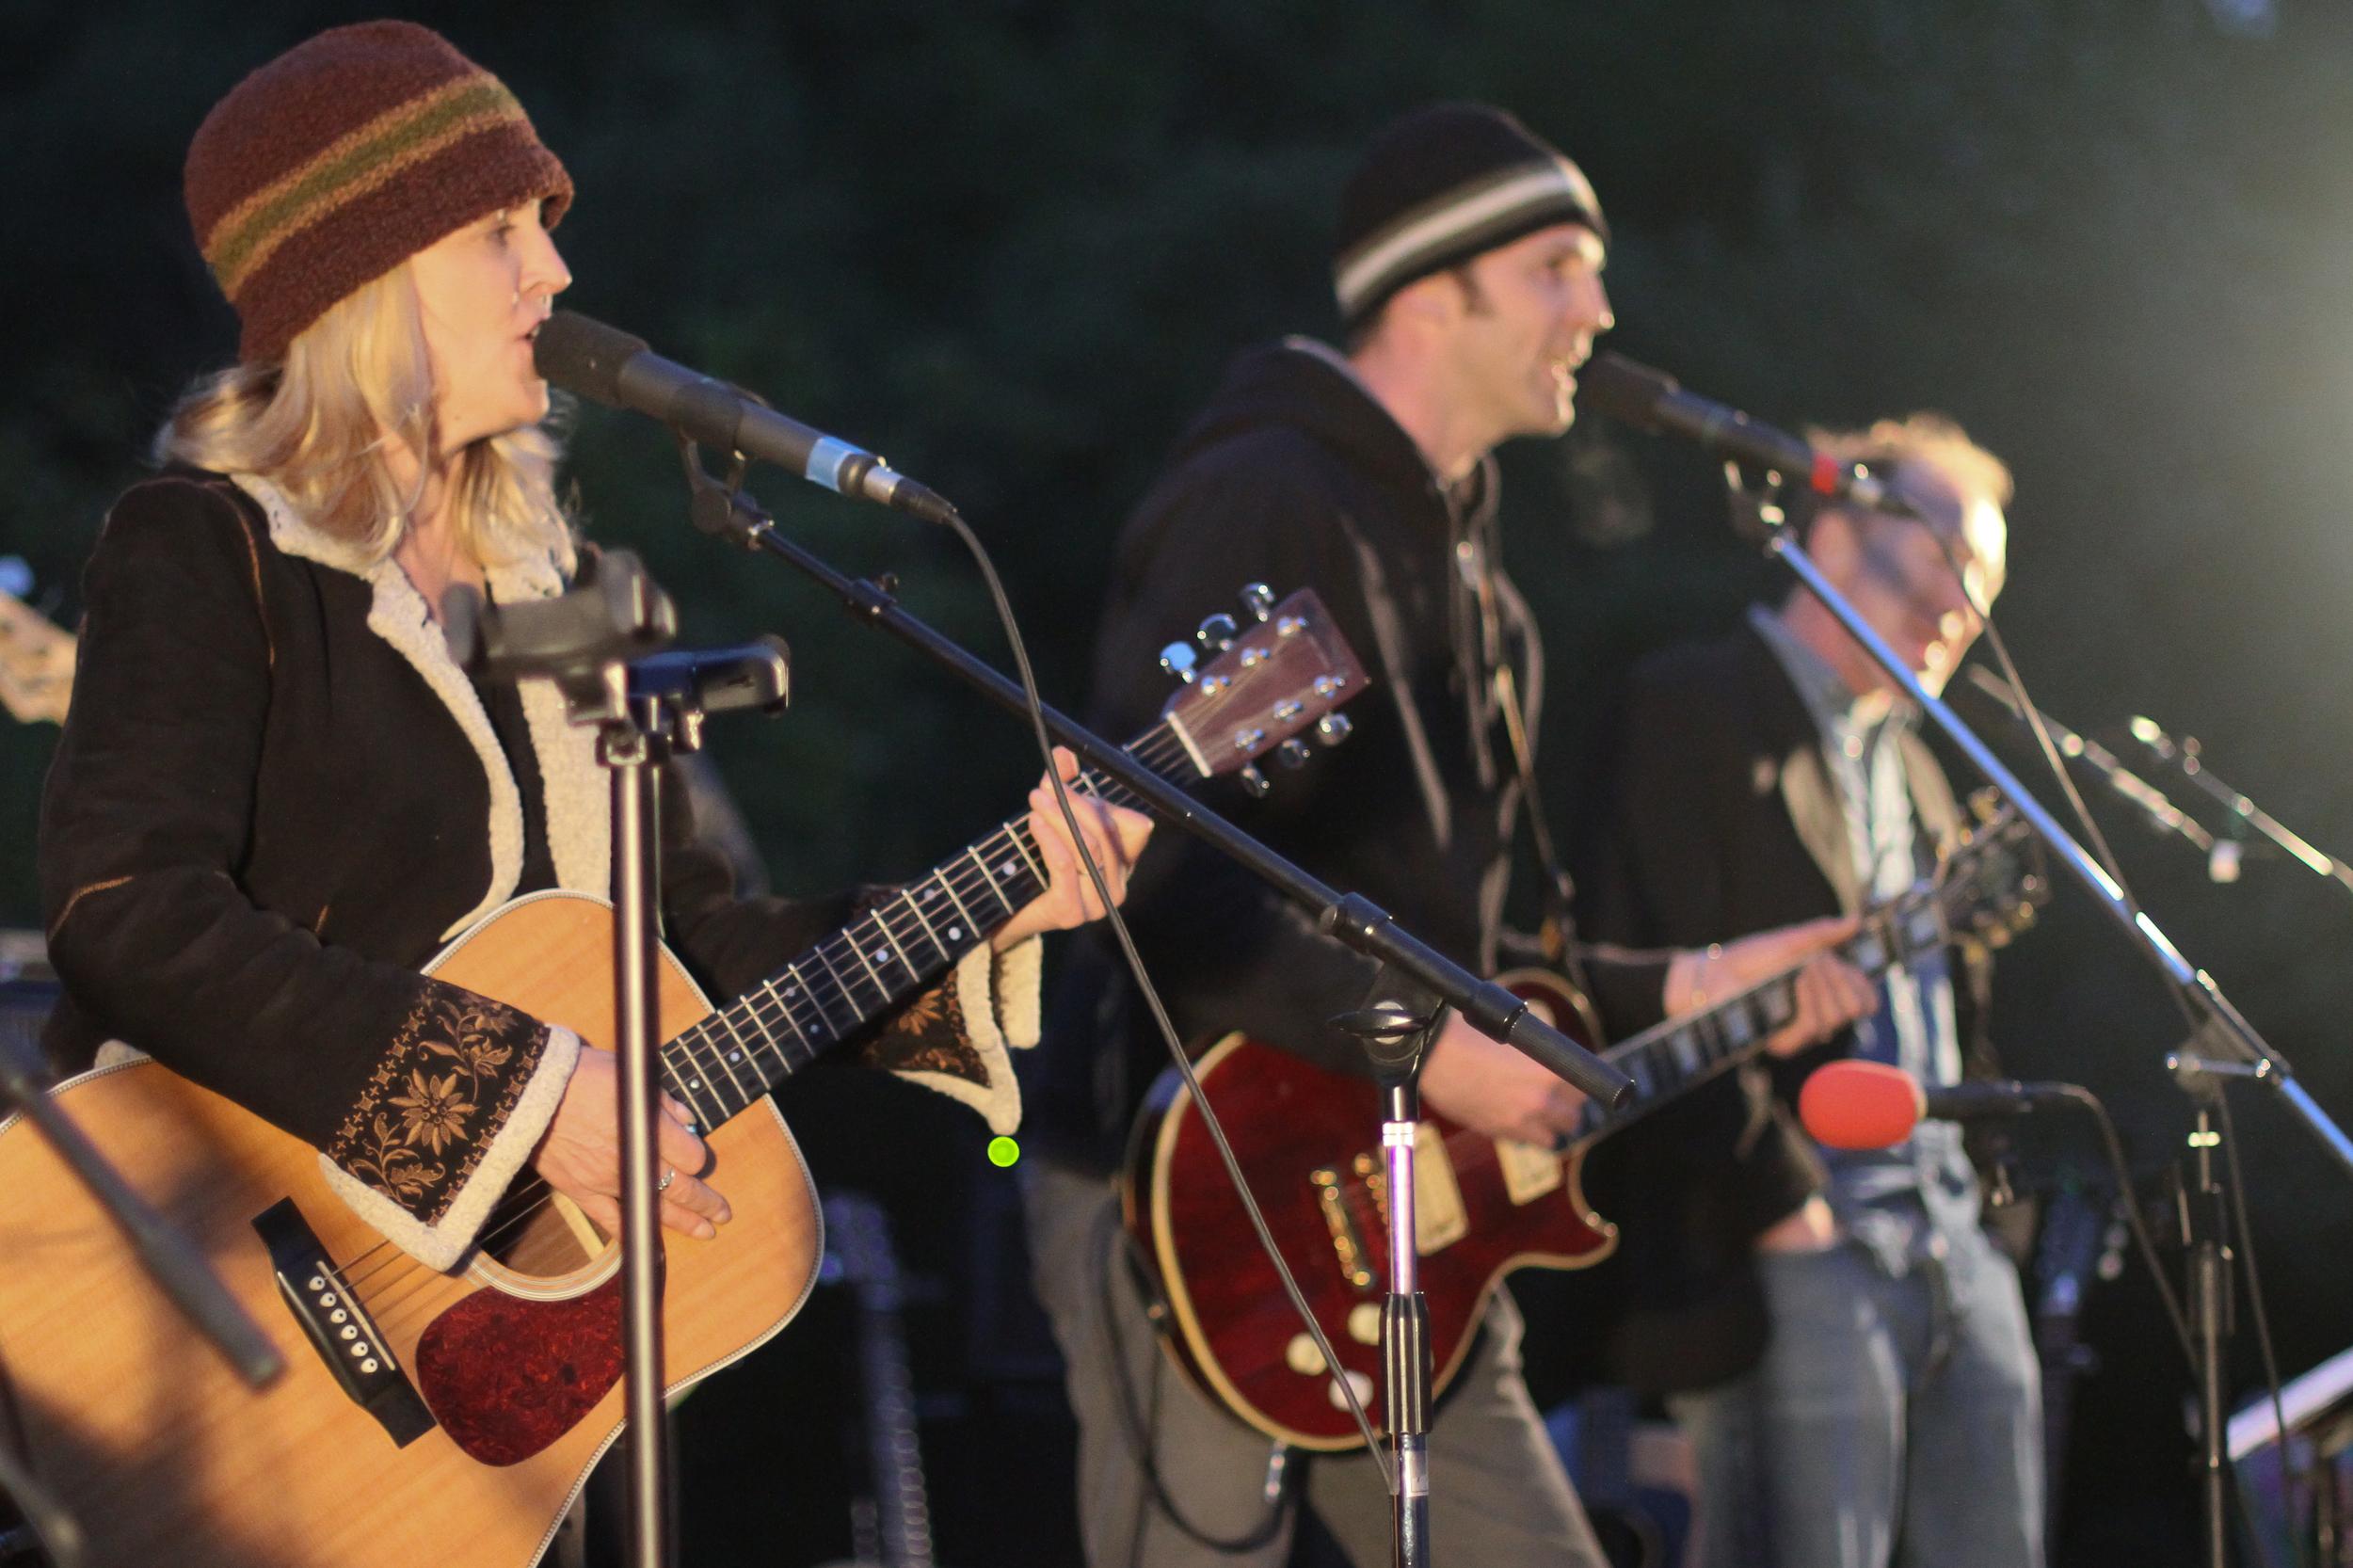 2011_05_21_-_Redgate_Ranch_Woodstock-124.jpg